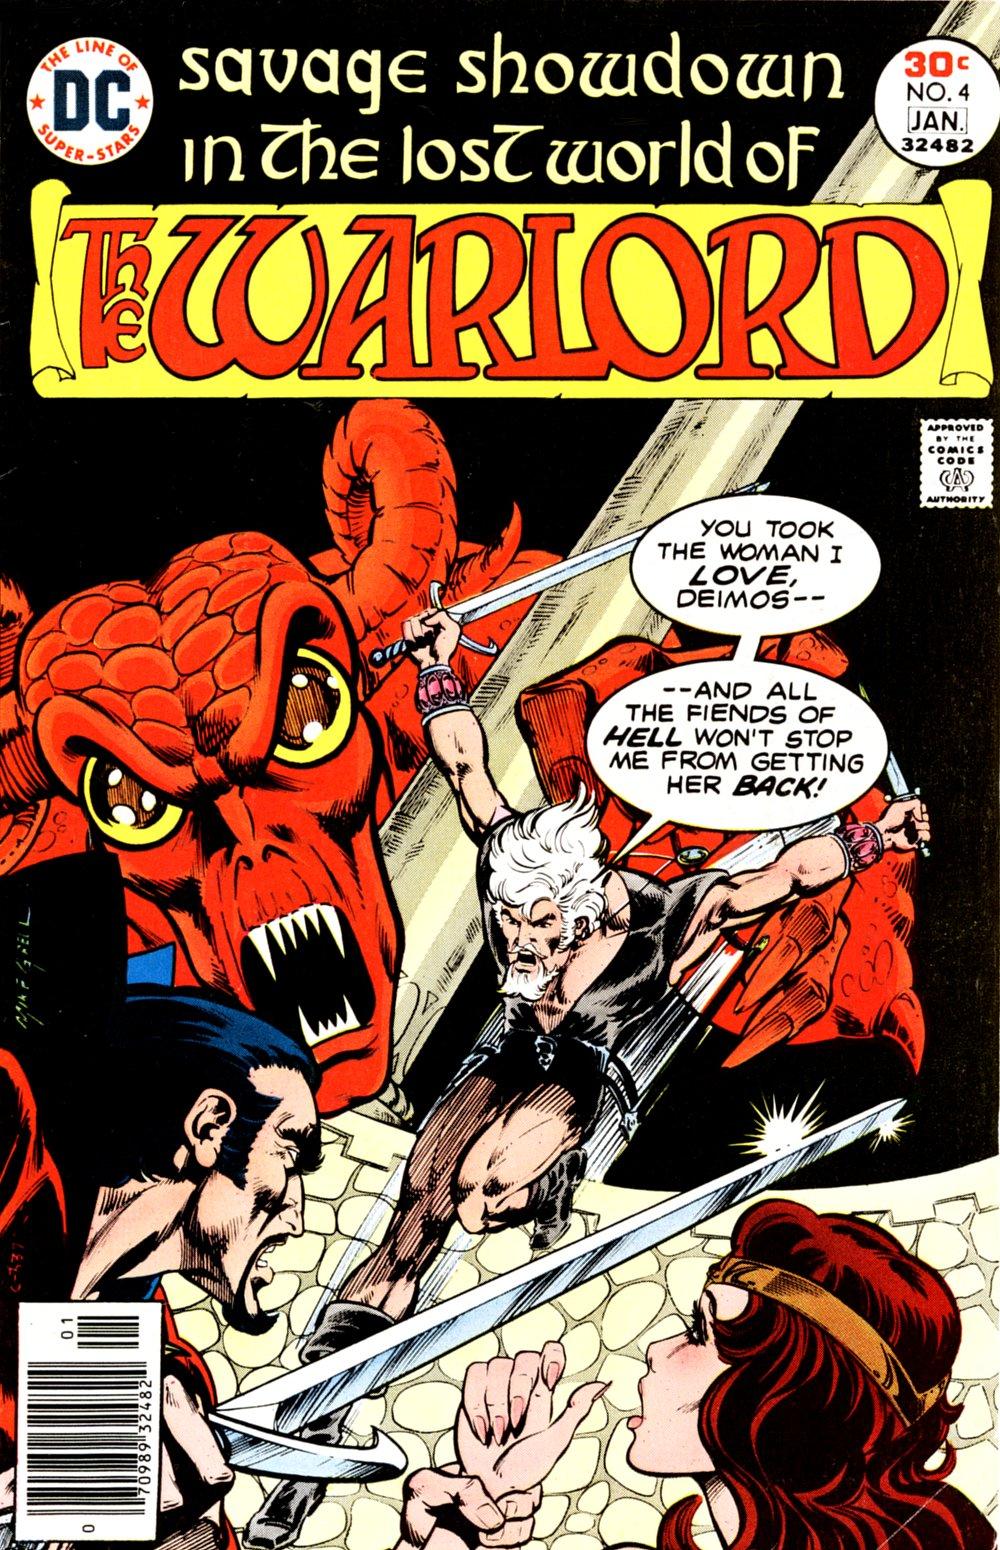 Warlord (1976) 4 Page 1